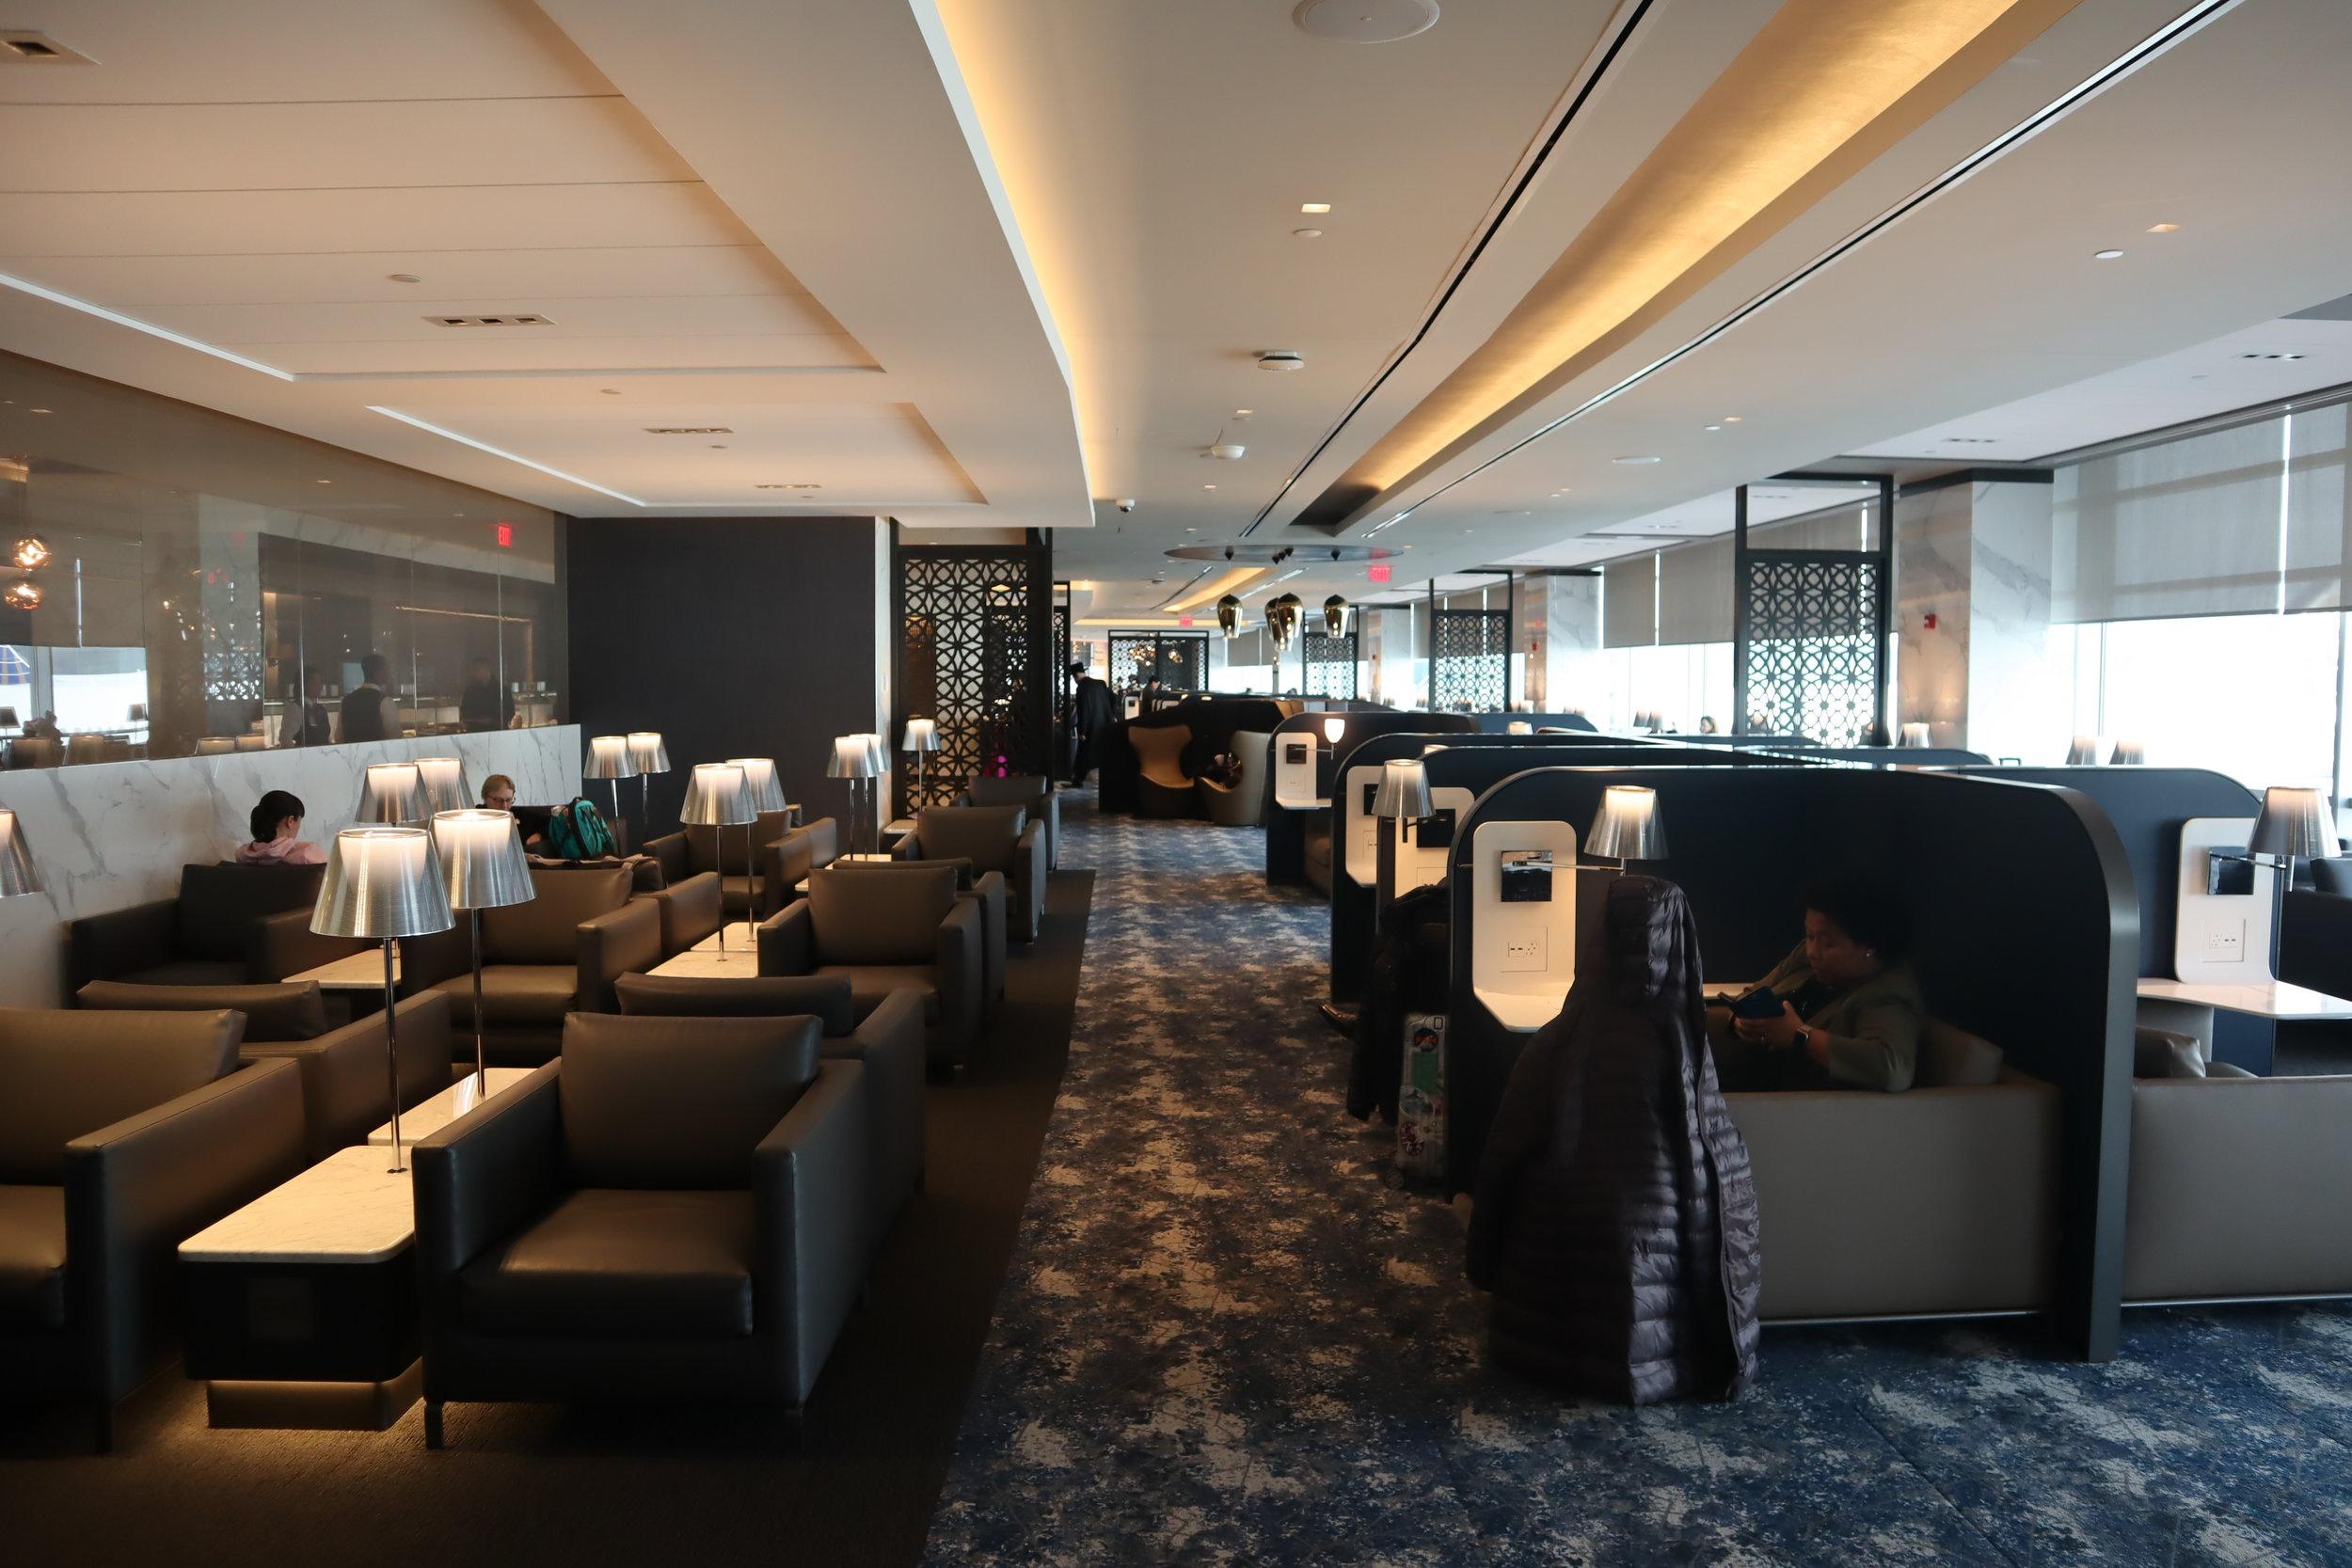 United Polaris Lounge Newark – Main seating area